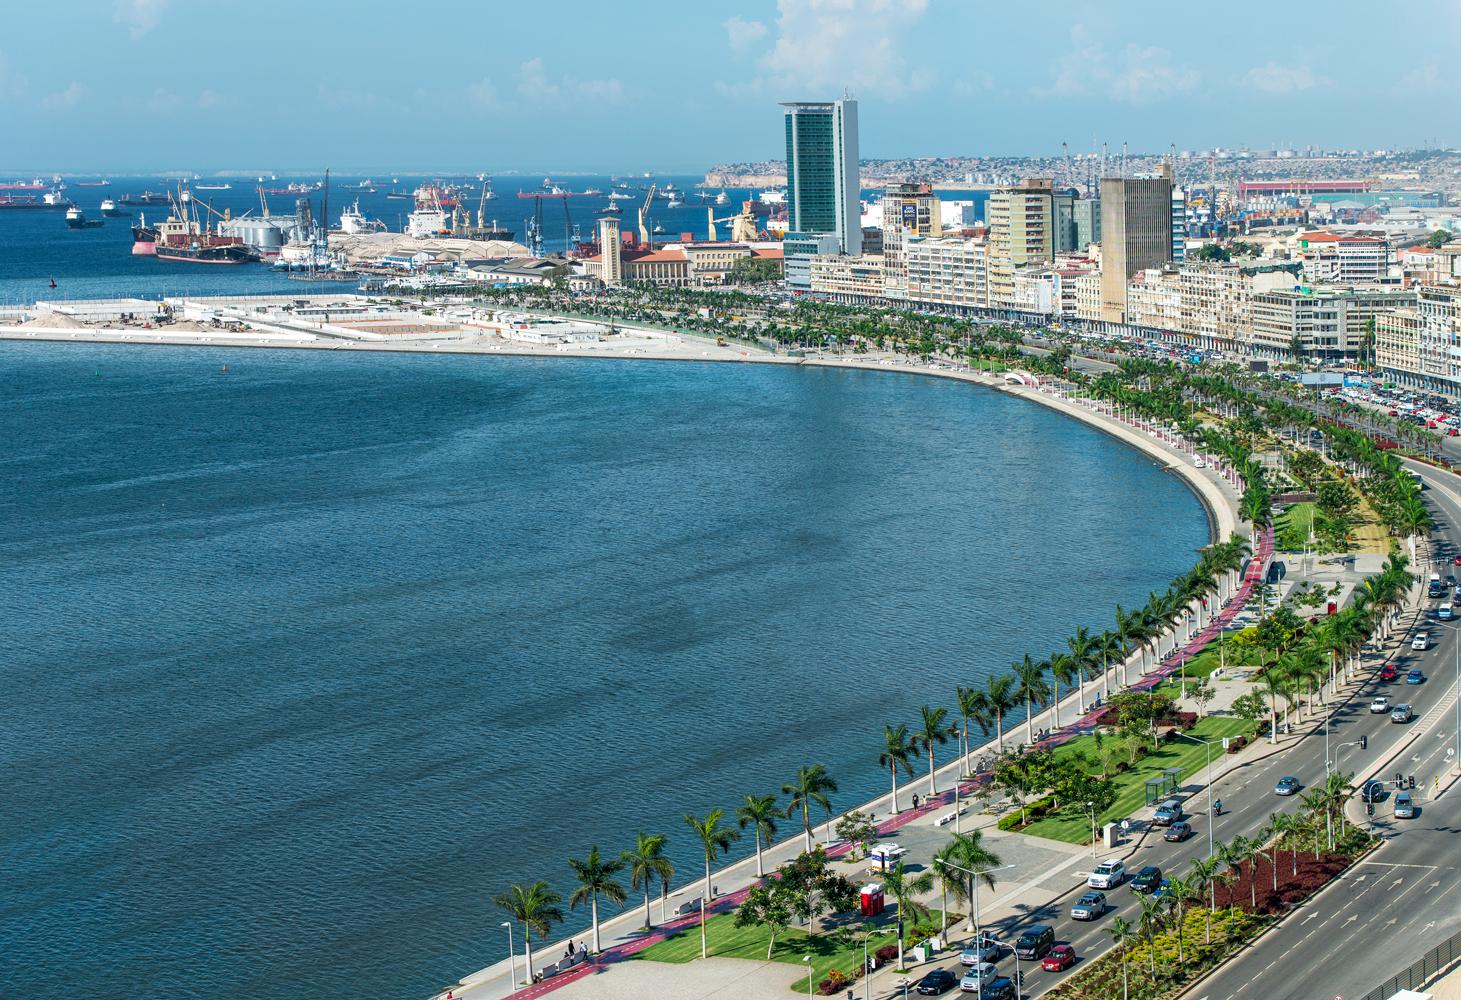 ангола фото города кратко